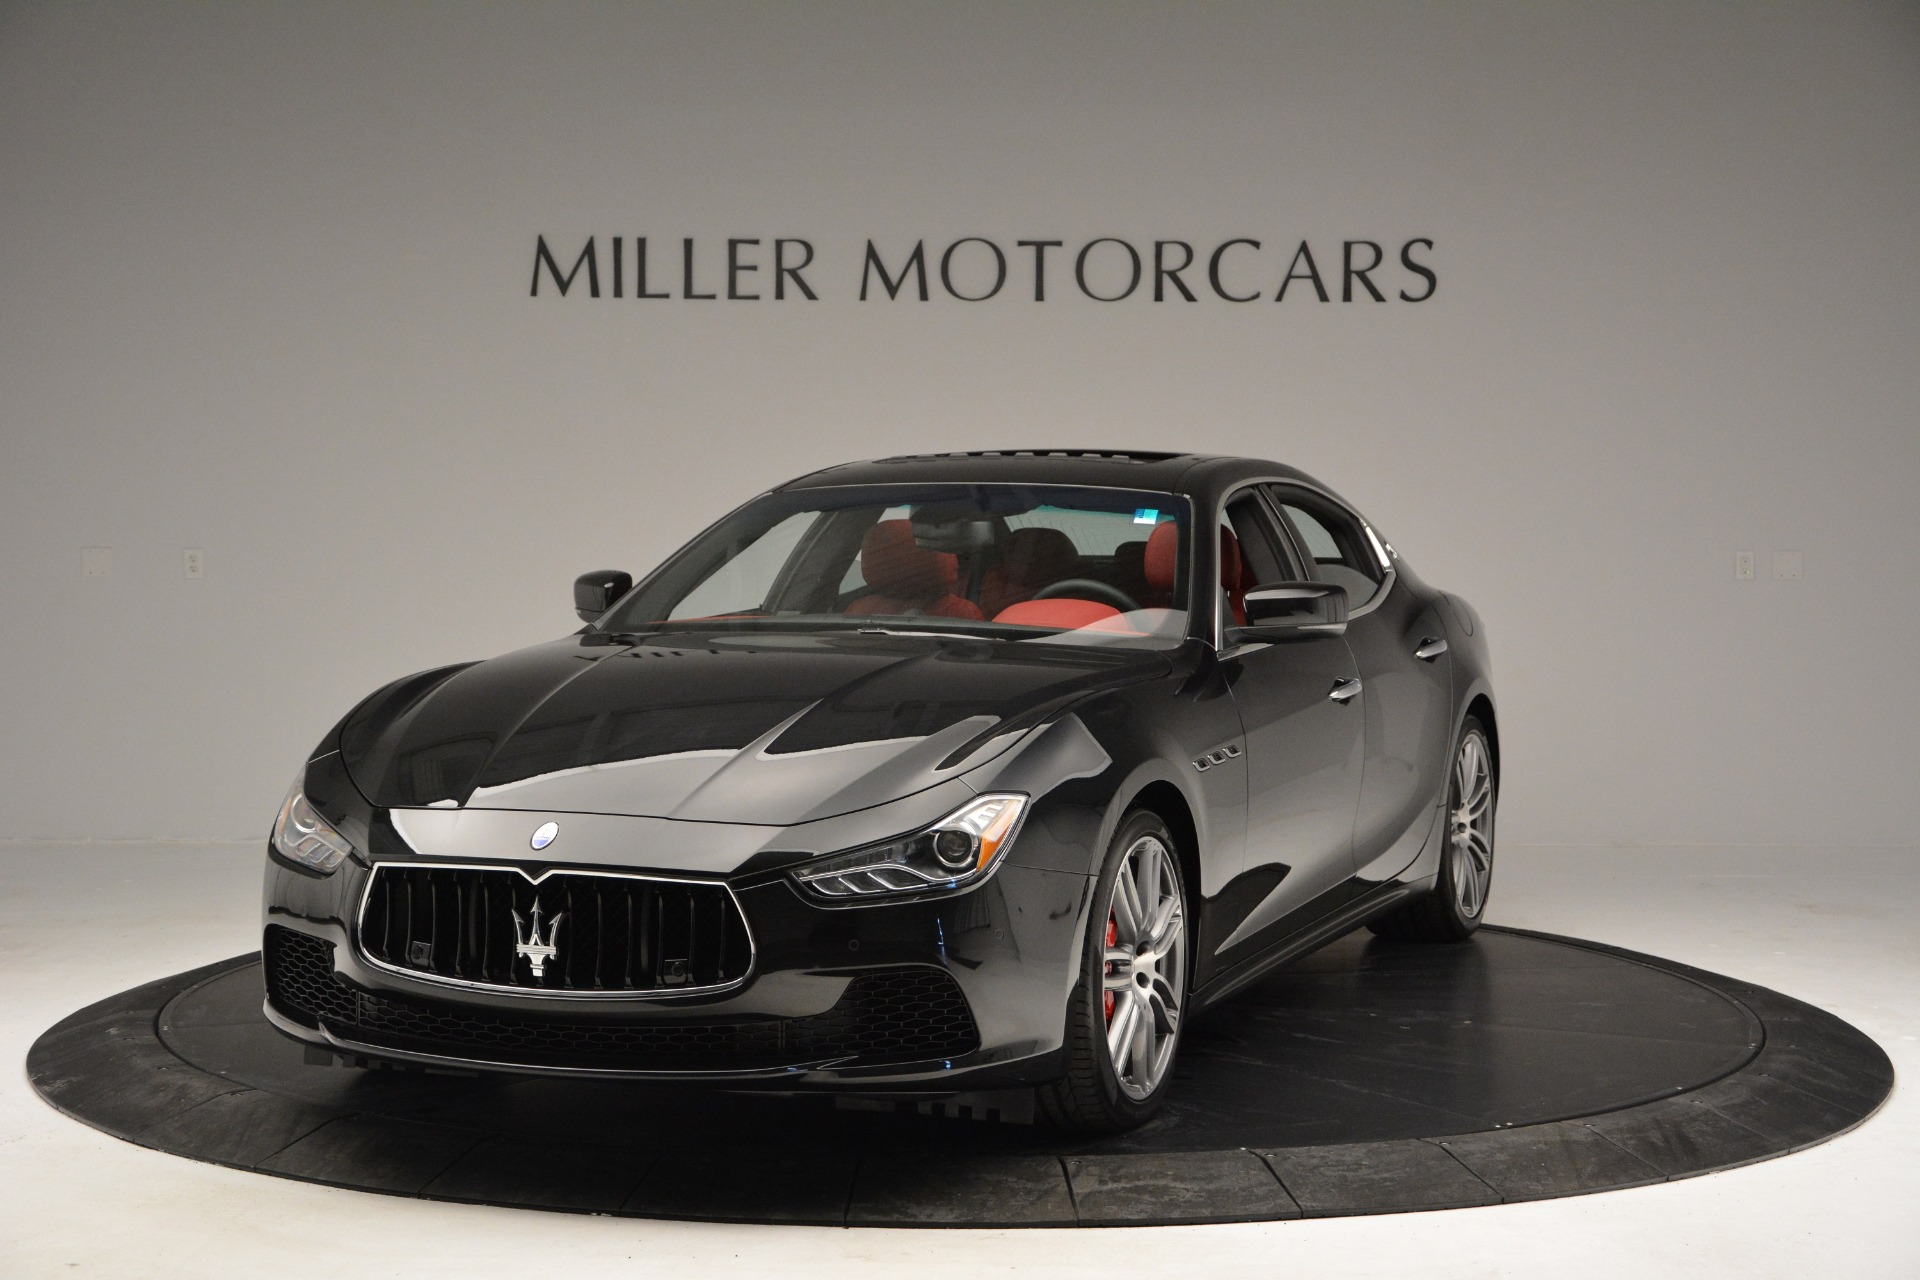 New 2017 Maserati Ghibli S Q4 For Sale In Westport, CT 610_main